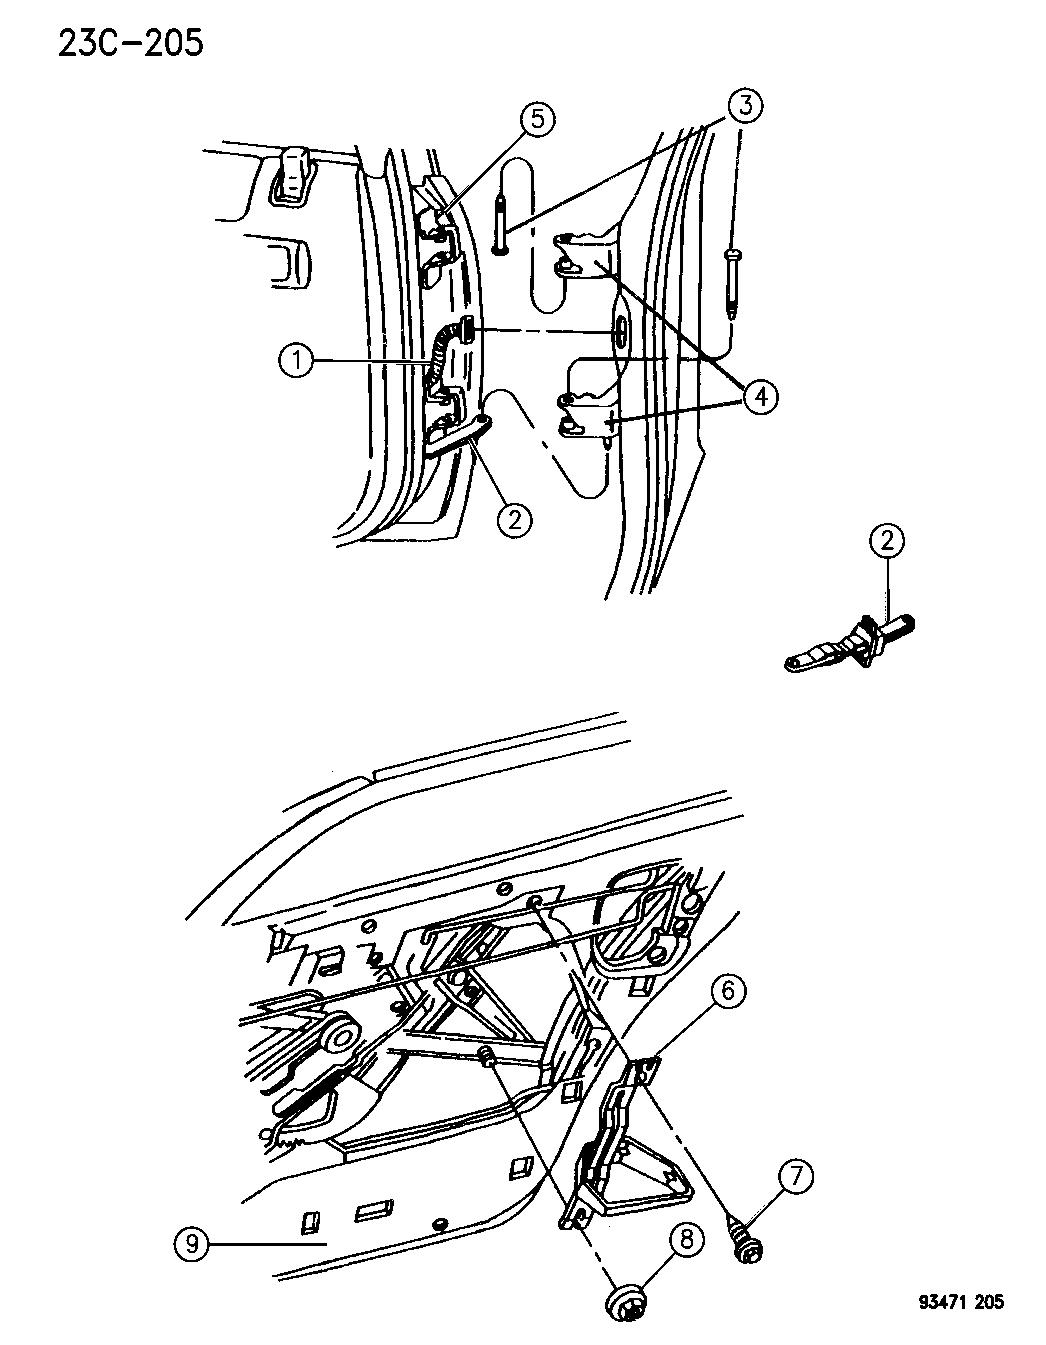 1994 Chrysler Concorde Door, Rear Shell & Hinges